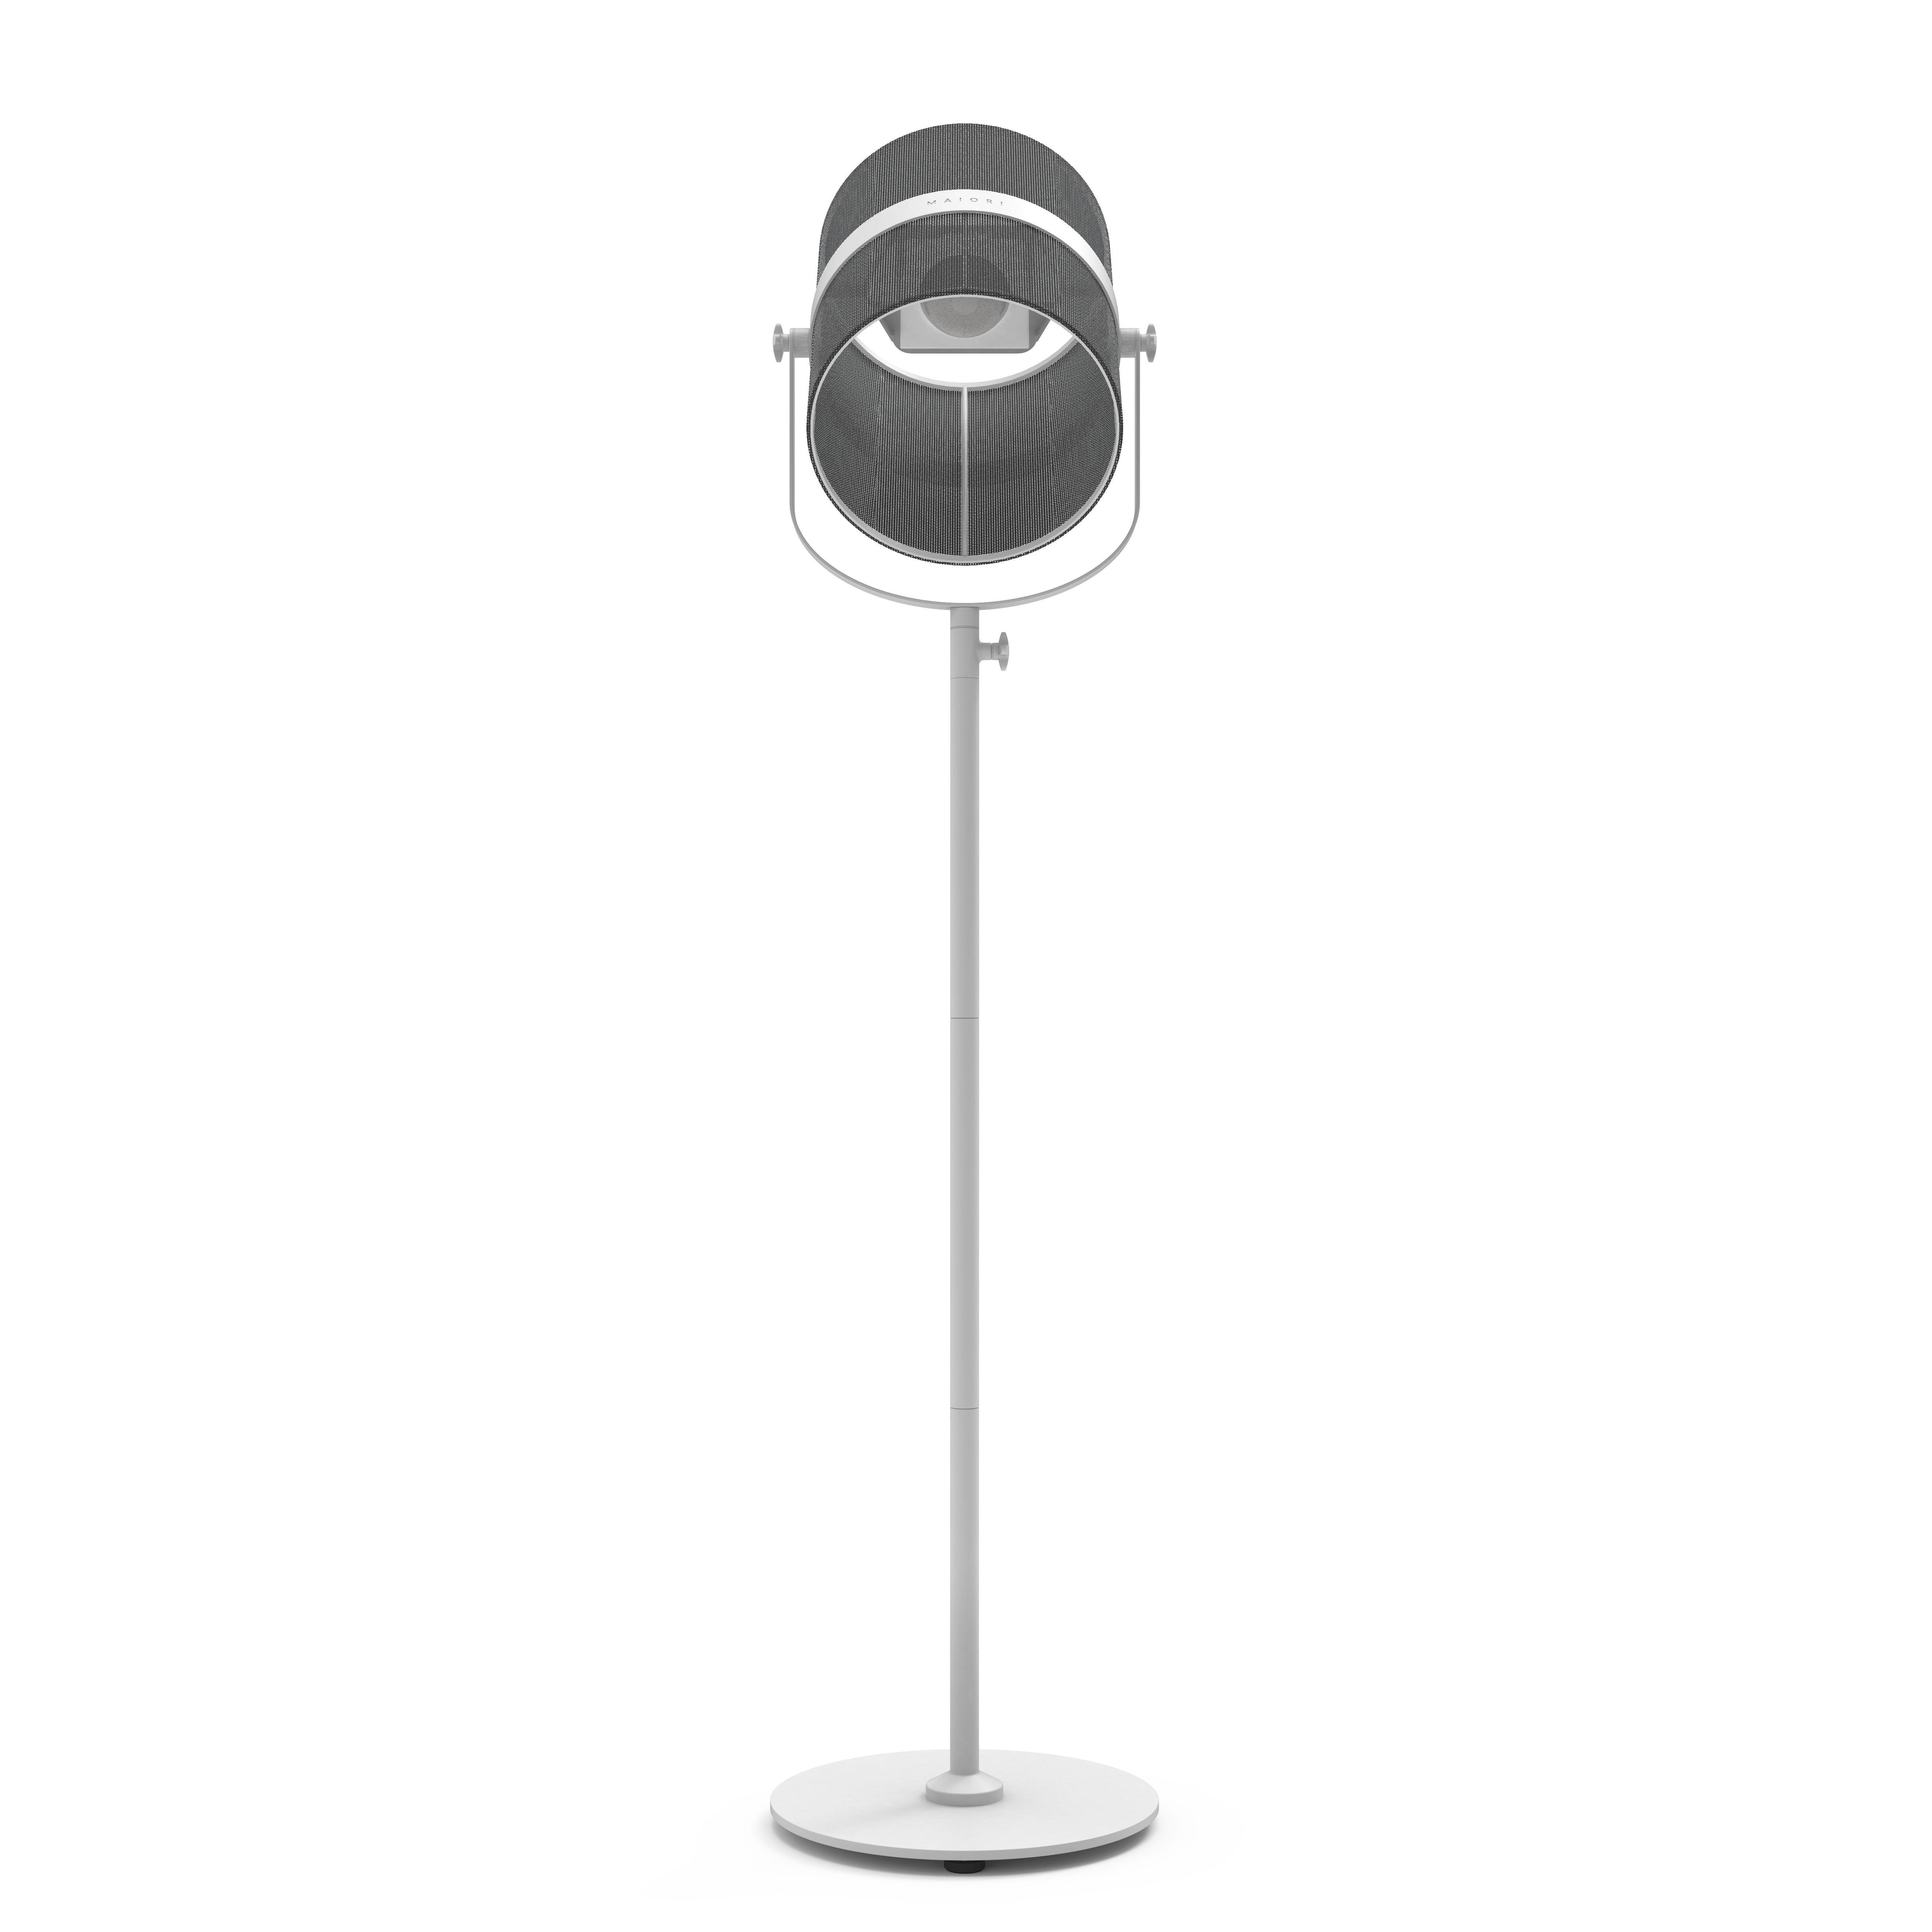 Luminaire - Lampadaires - Lampadaire solaire La Lampe Paris LED / Hybride & connectée - Maiori - Charbon / Pied blanc - Aluminium peint, Tissu